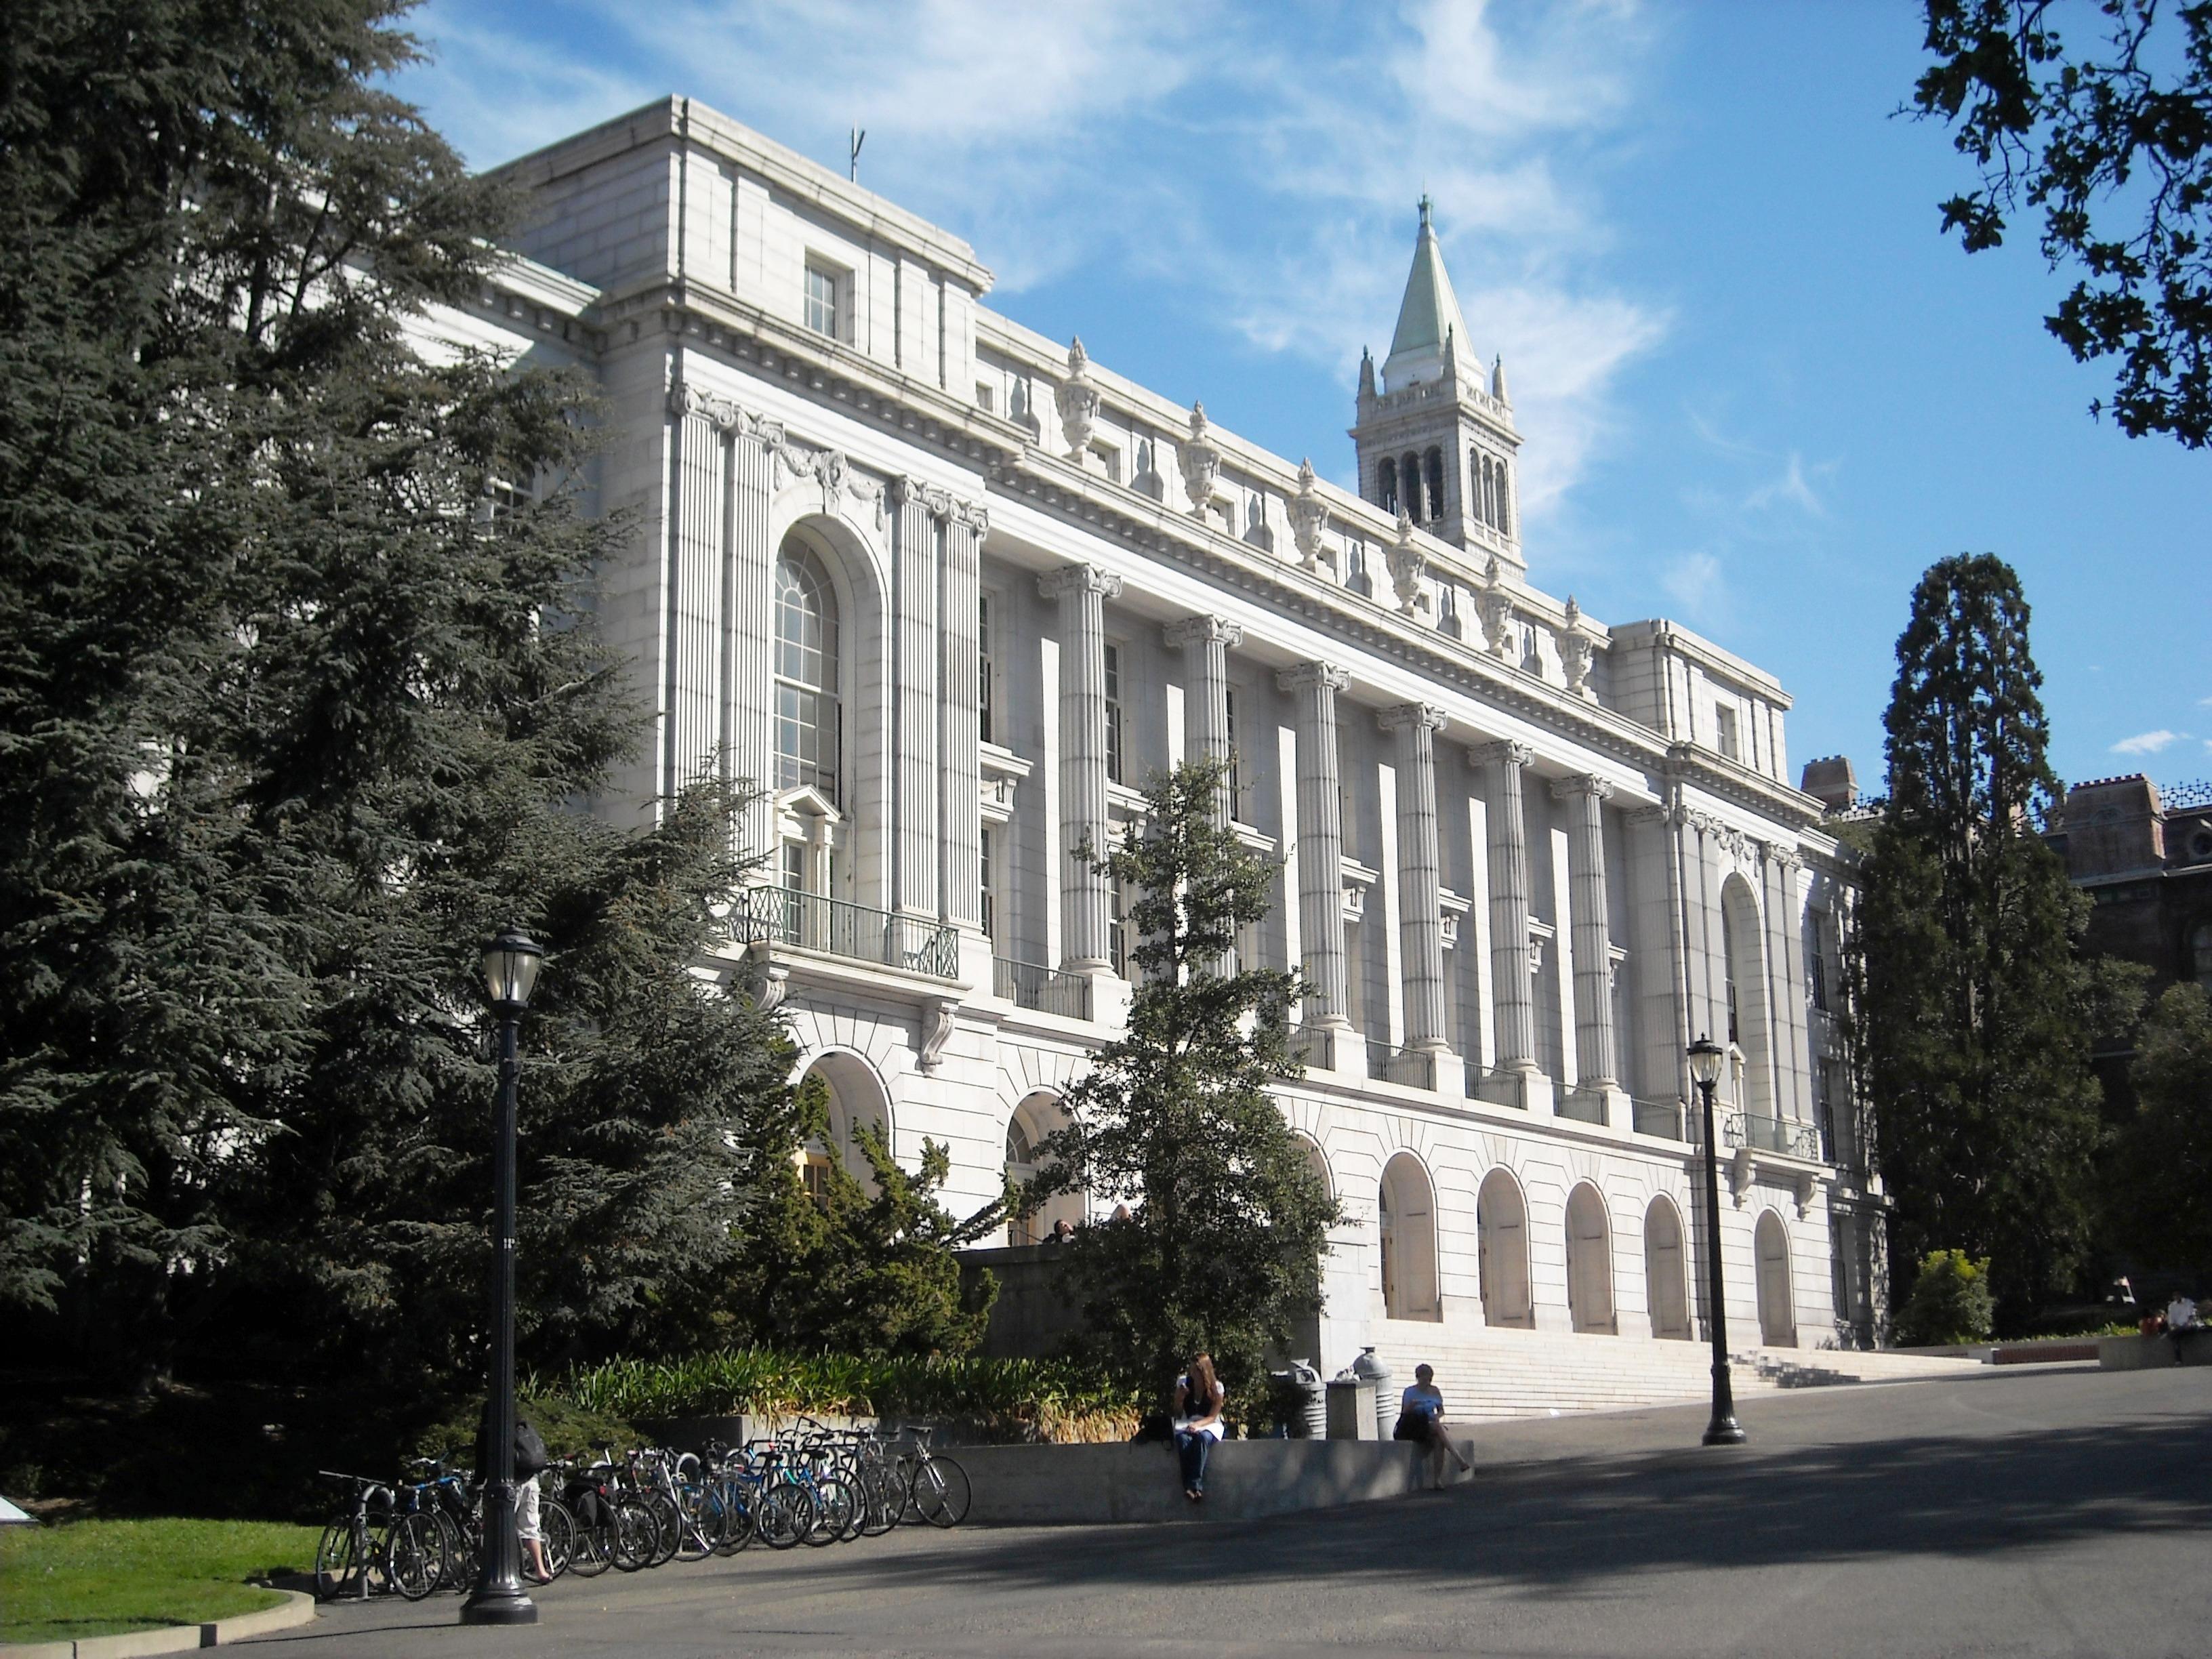 University of California Berkeley (UCB)